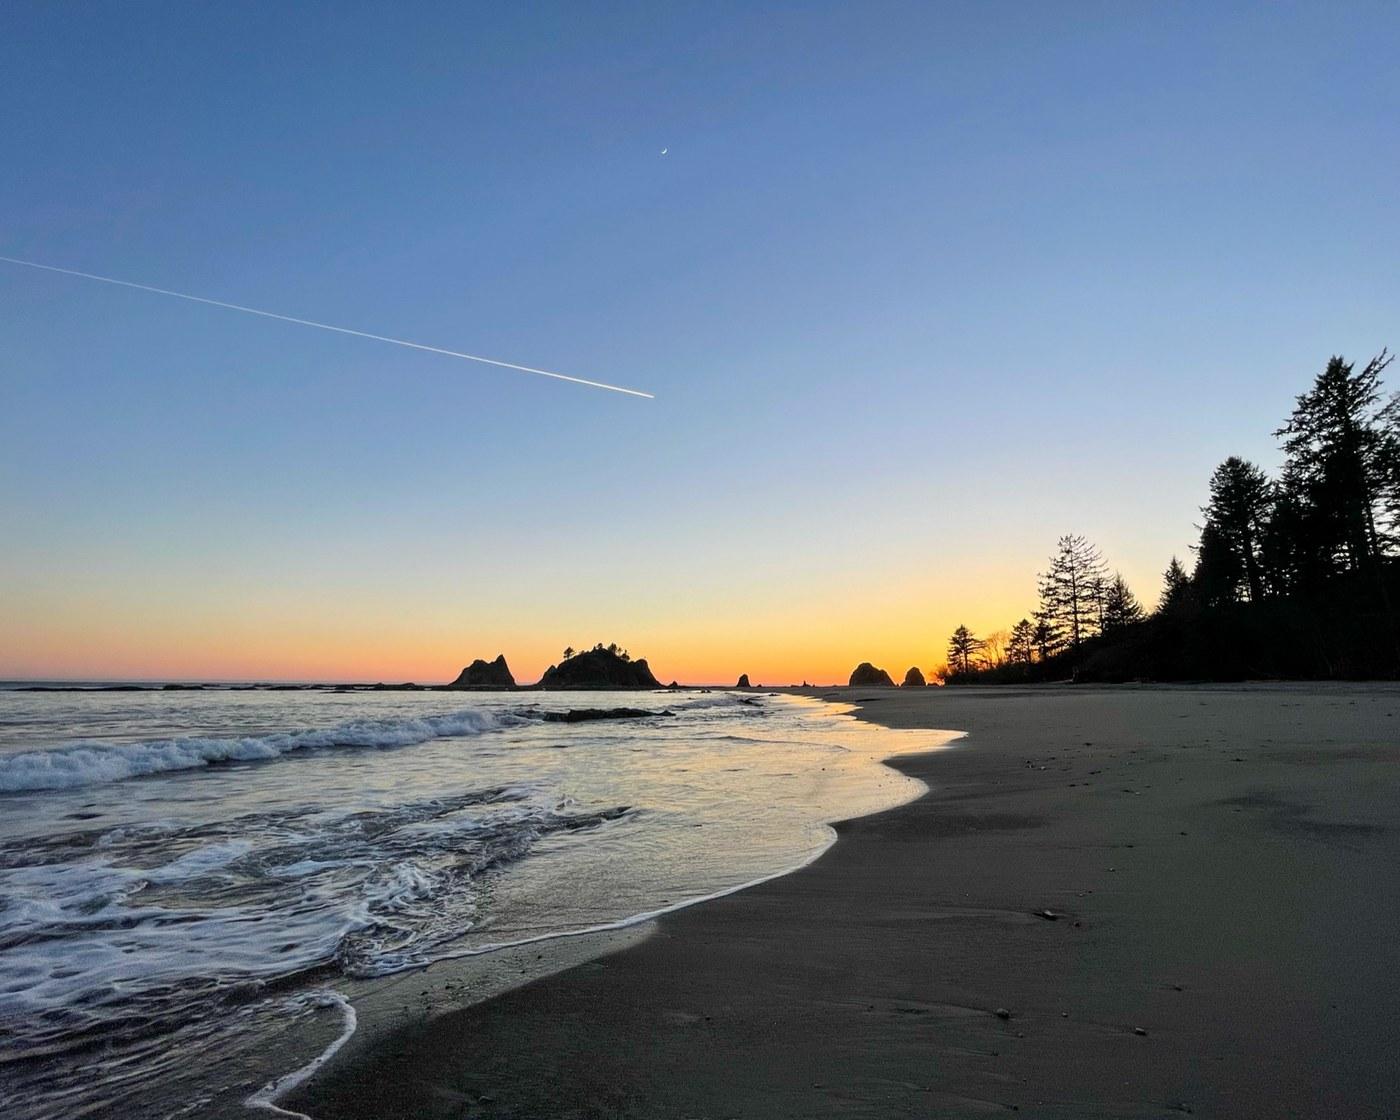 A sun sets beyond a sandy beach, casting warm colors into the sky.